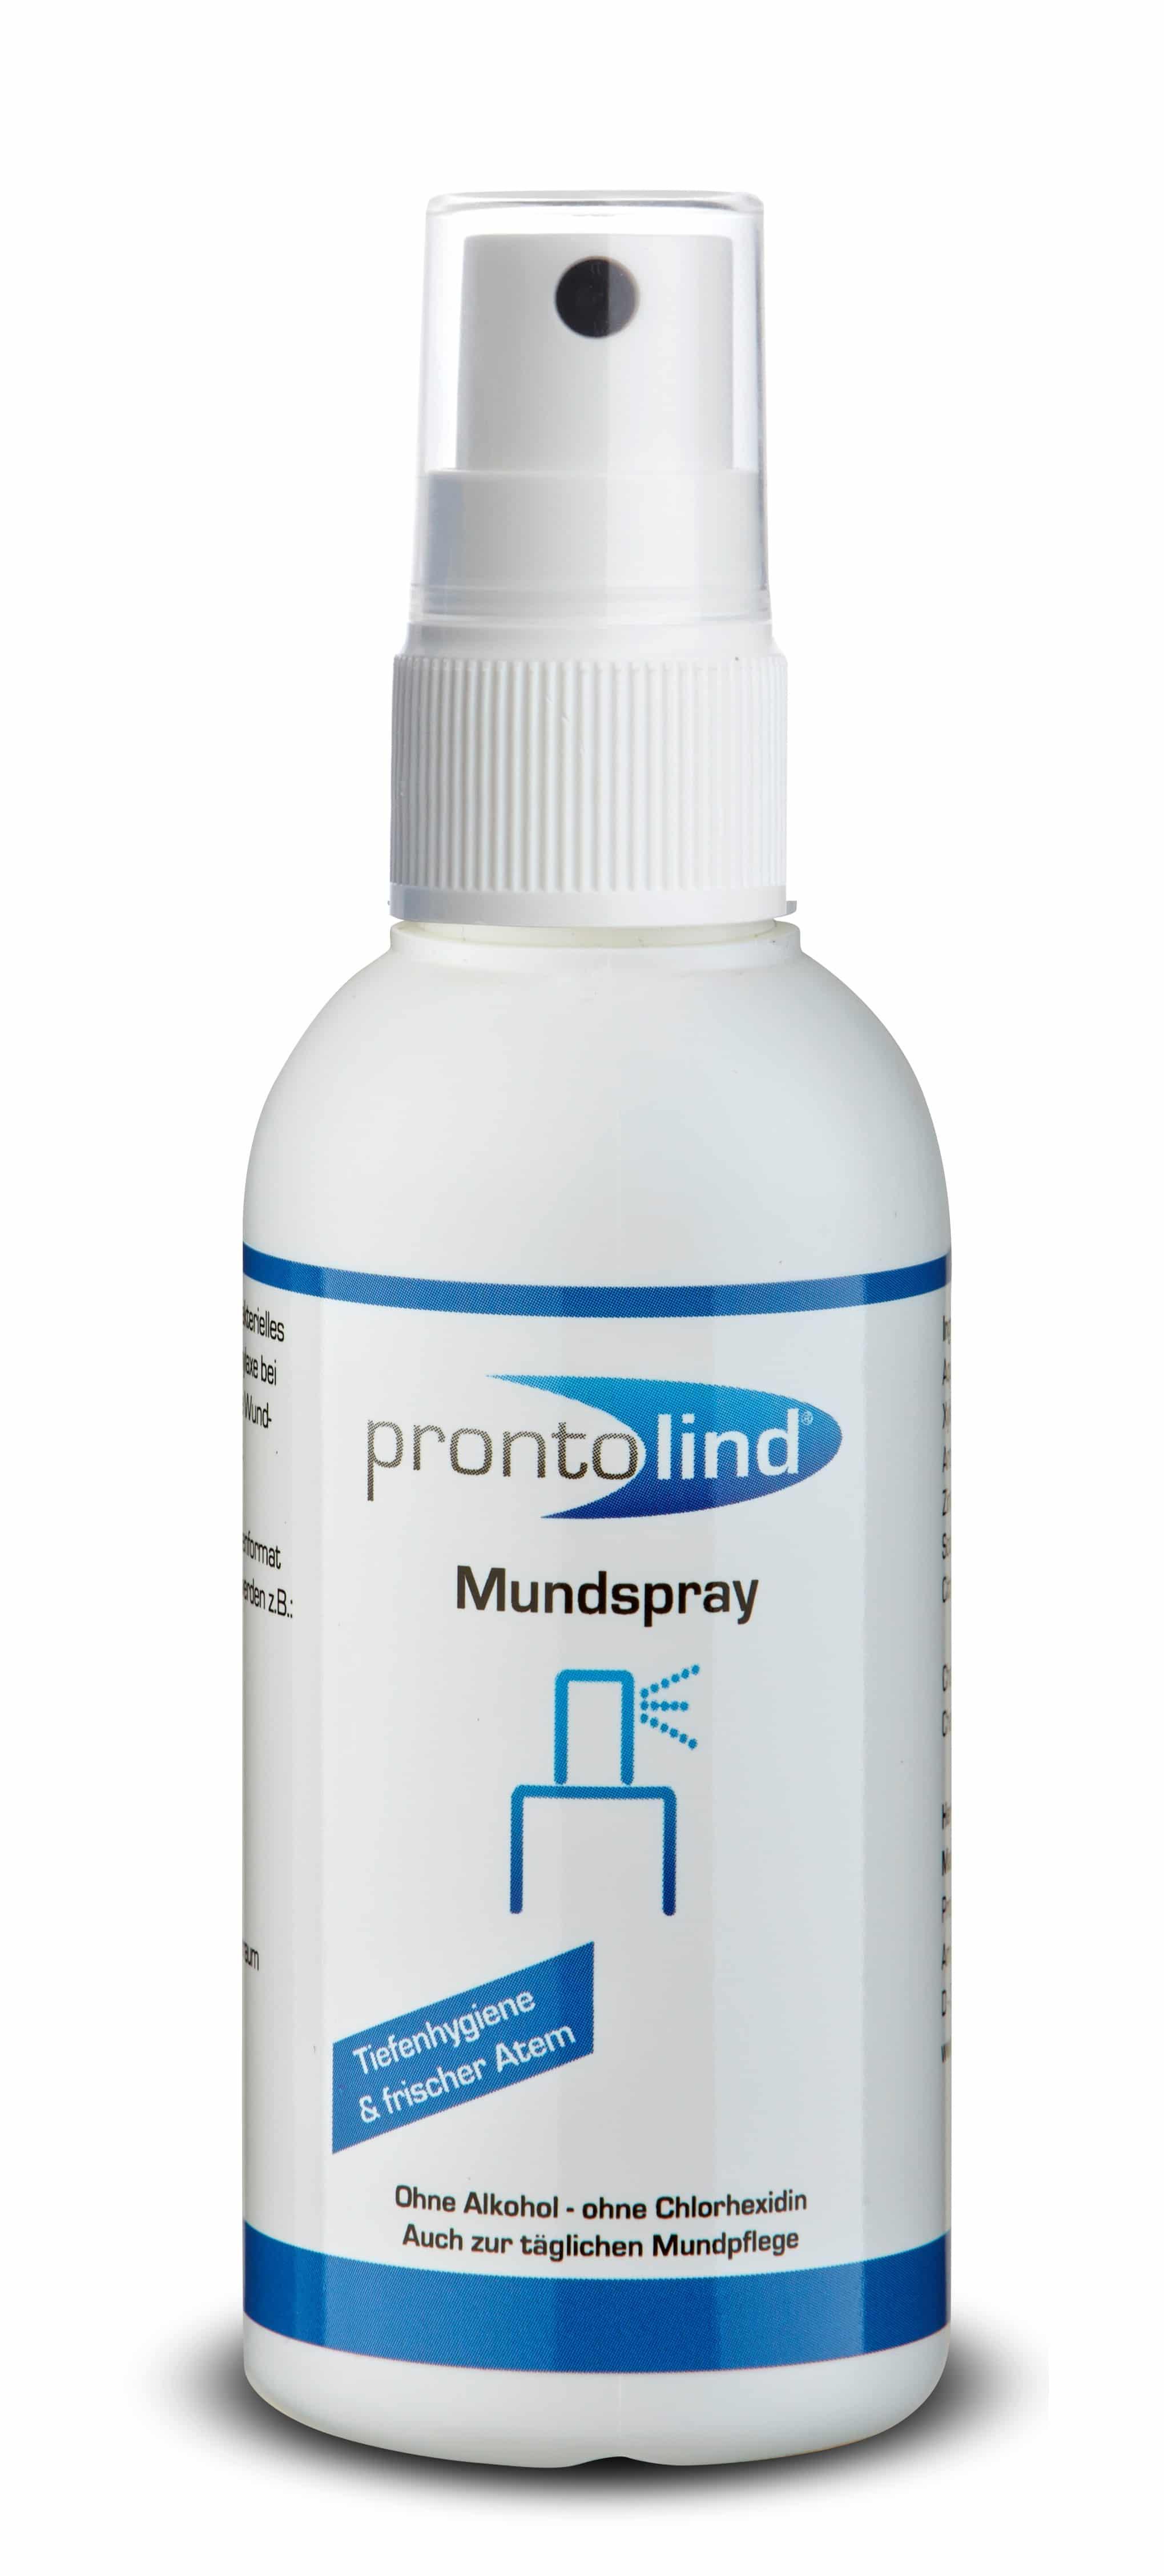 Prontolind Mundspray